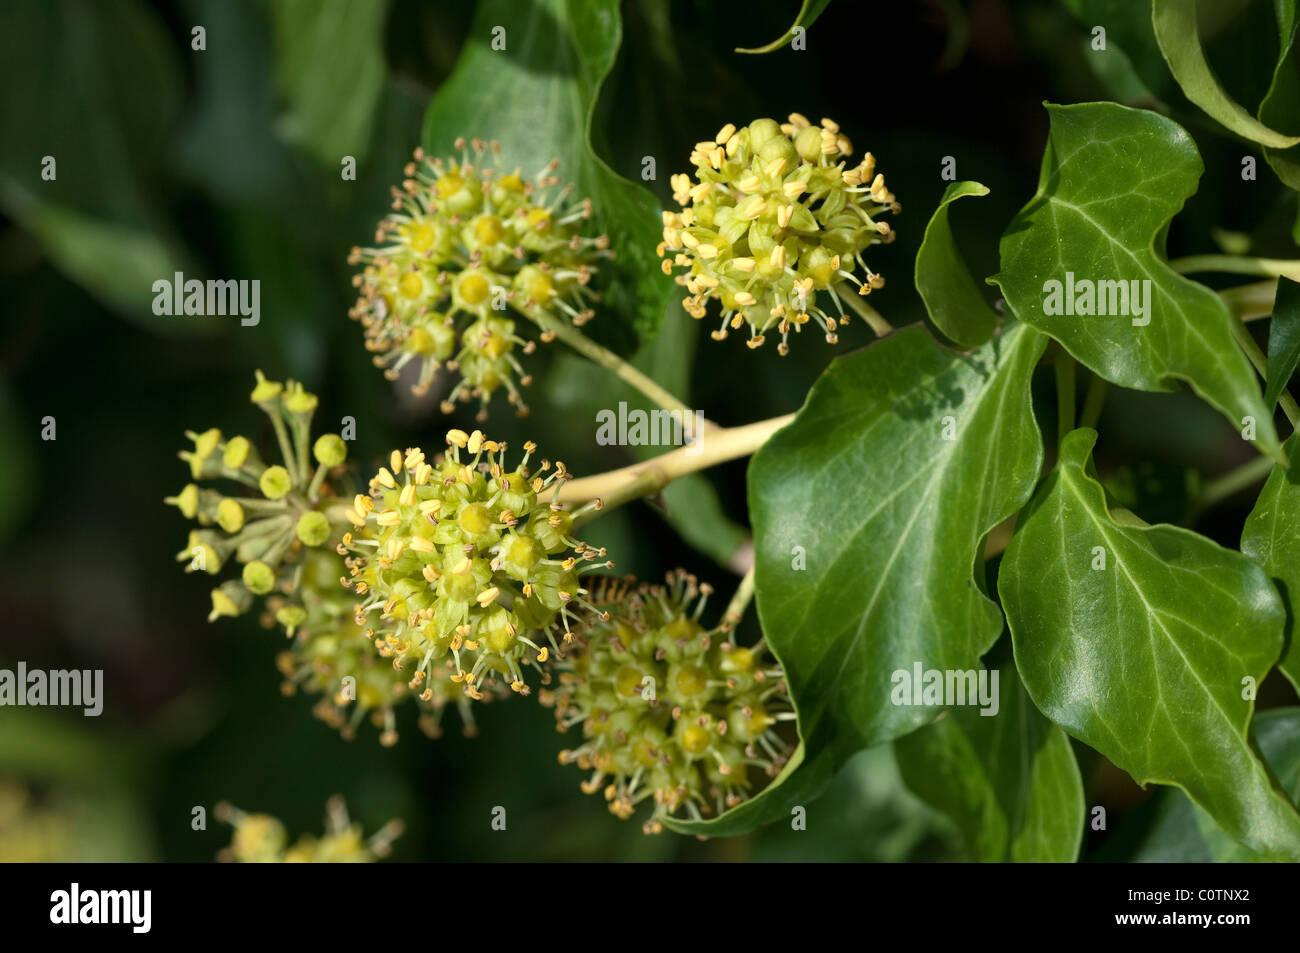 Common Ivy, English Ivy (Hedera helix), flowering twig. - Stock Image